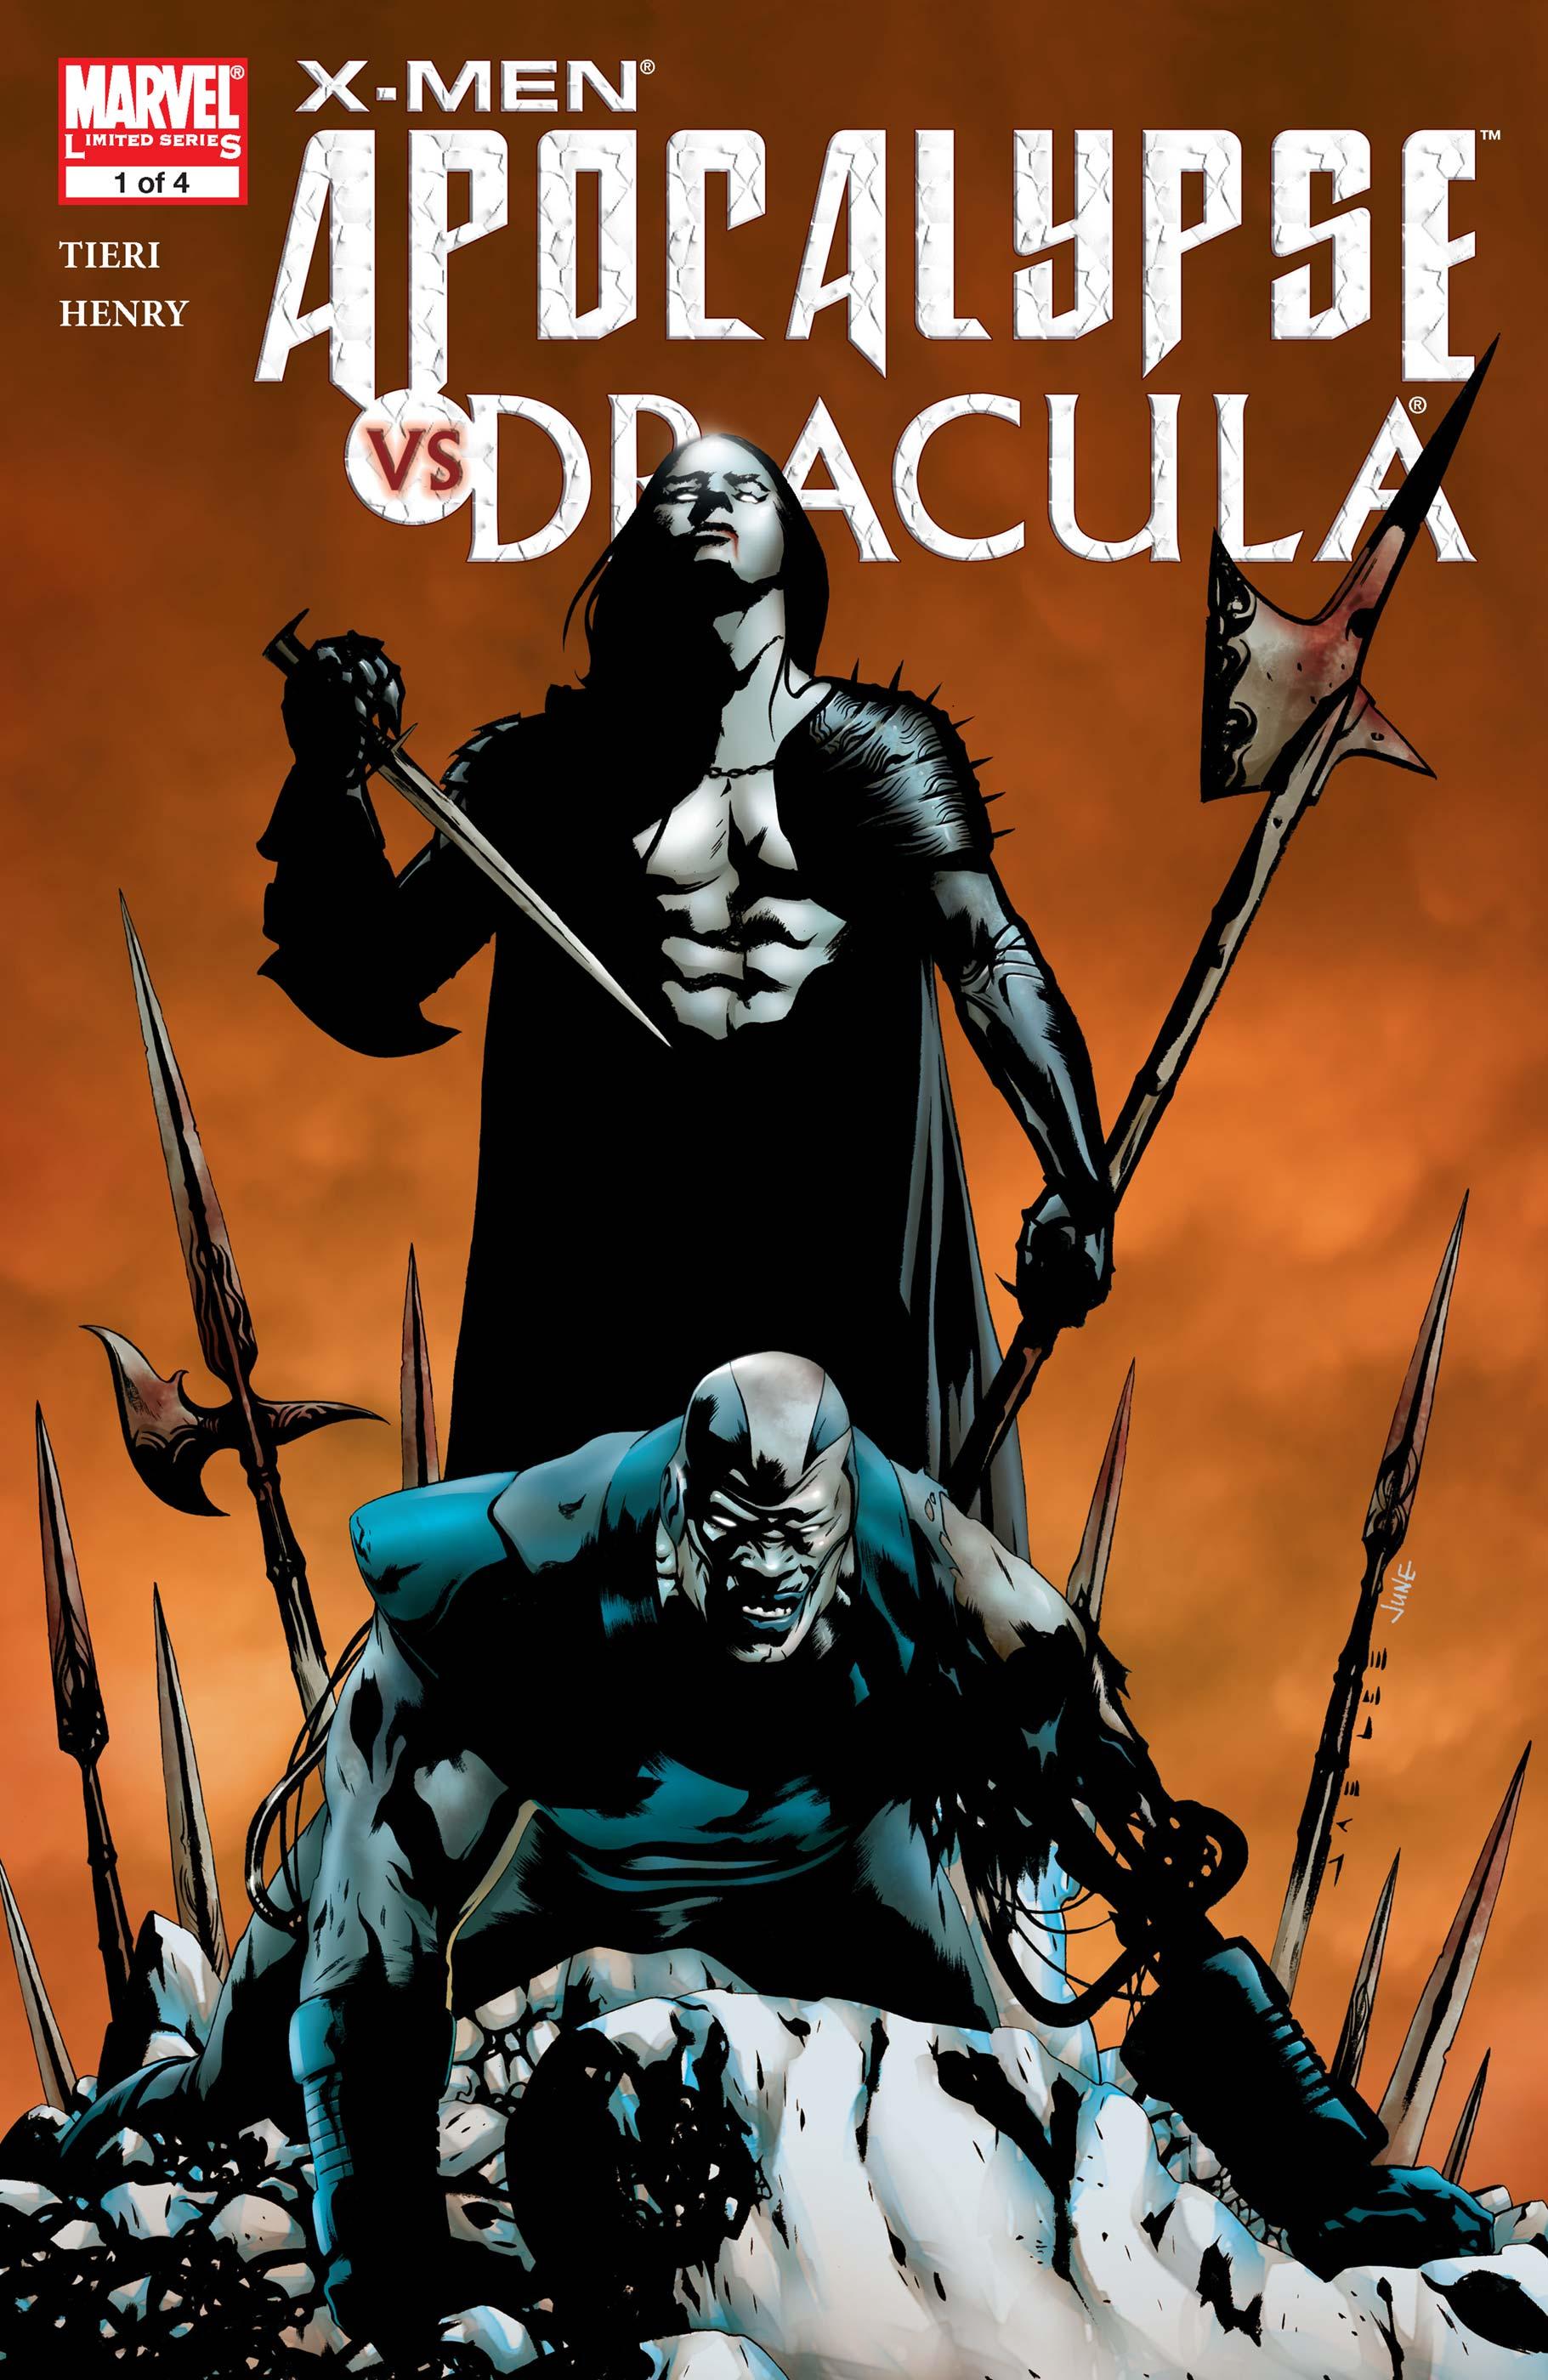 X-MEN: APOCALYPSE/DRACULA TPB (Trade Paperback)